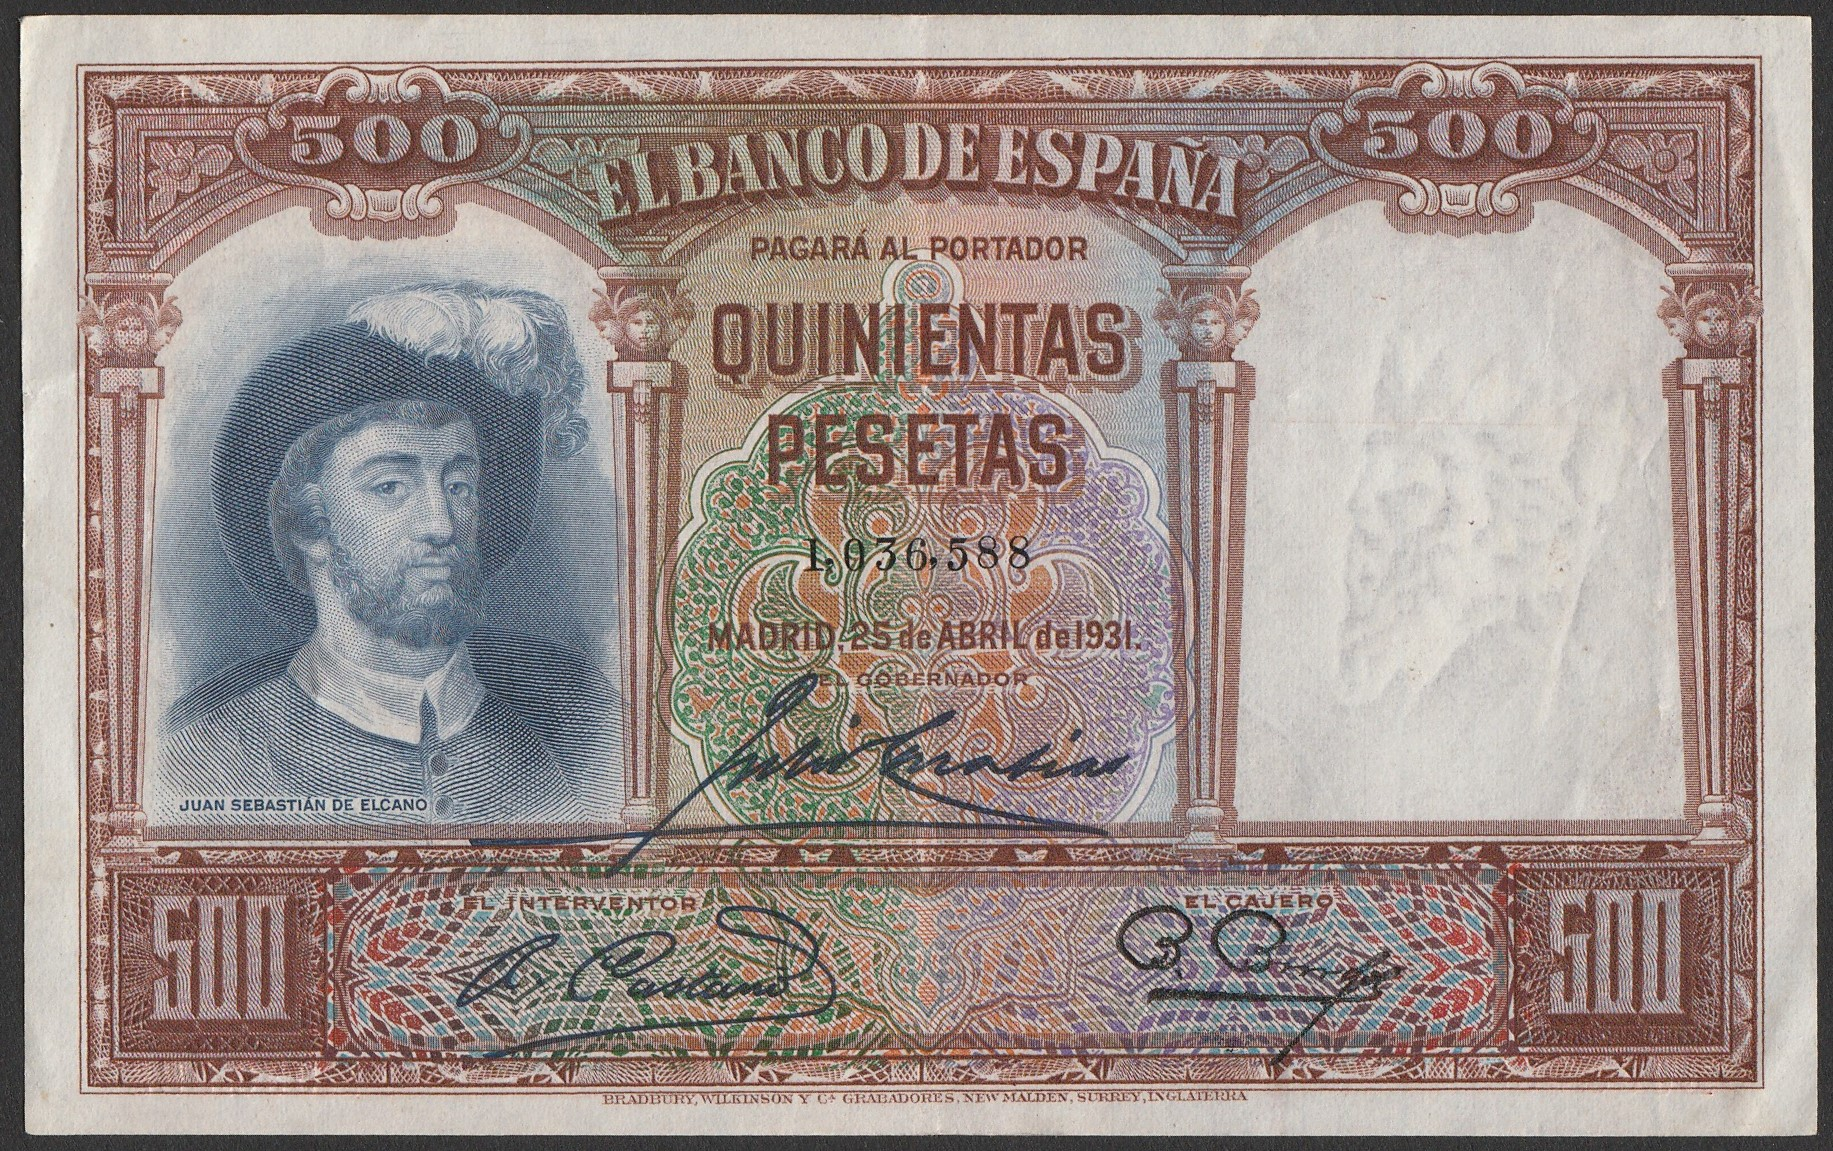 Fotos de billetes de 10000 pesetas 52